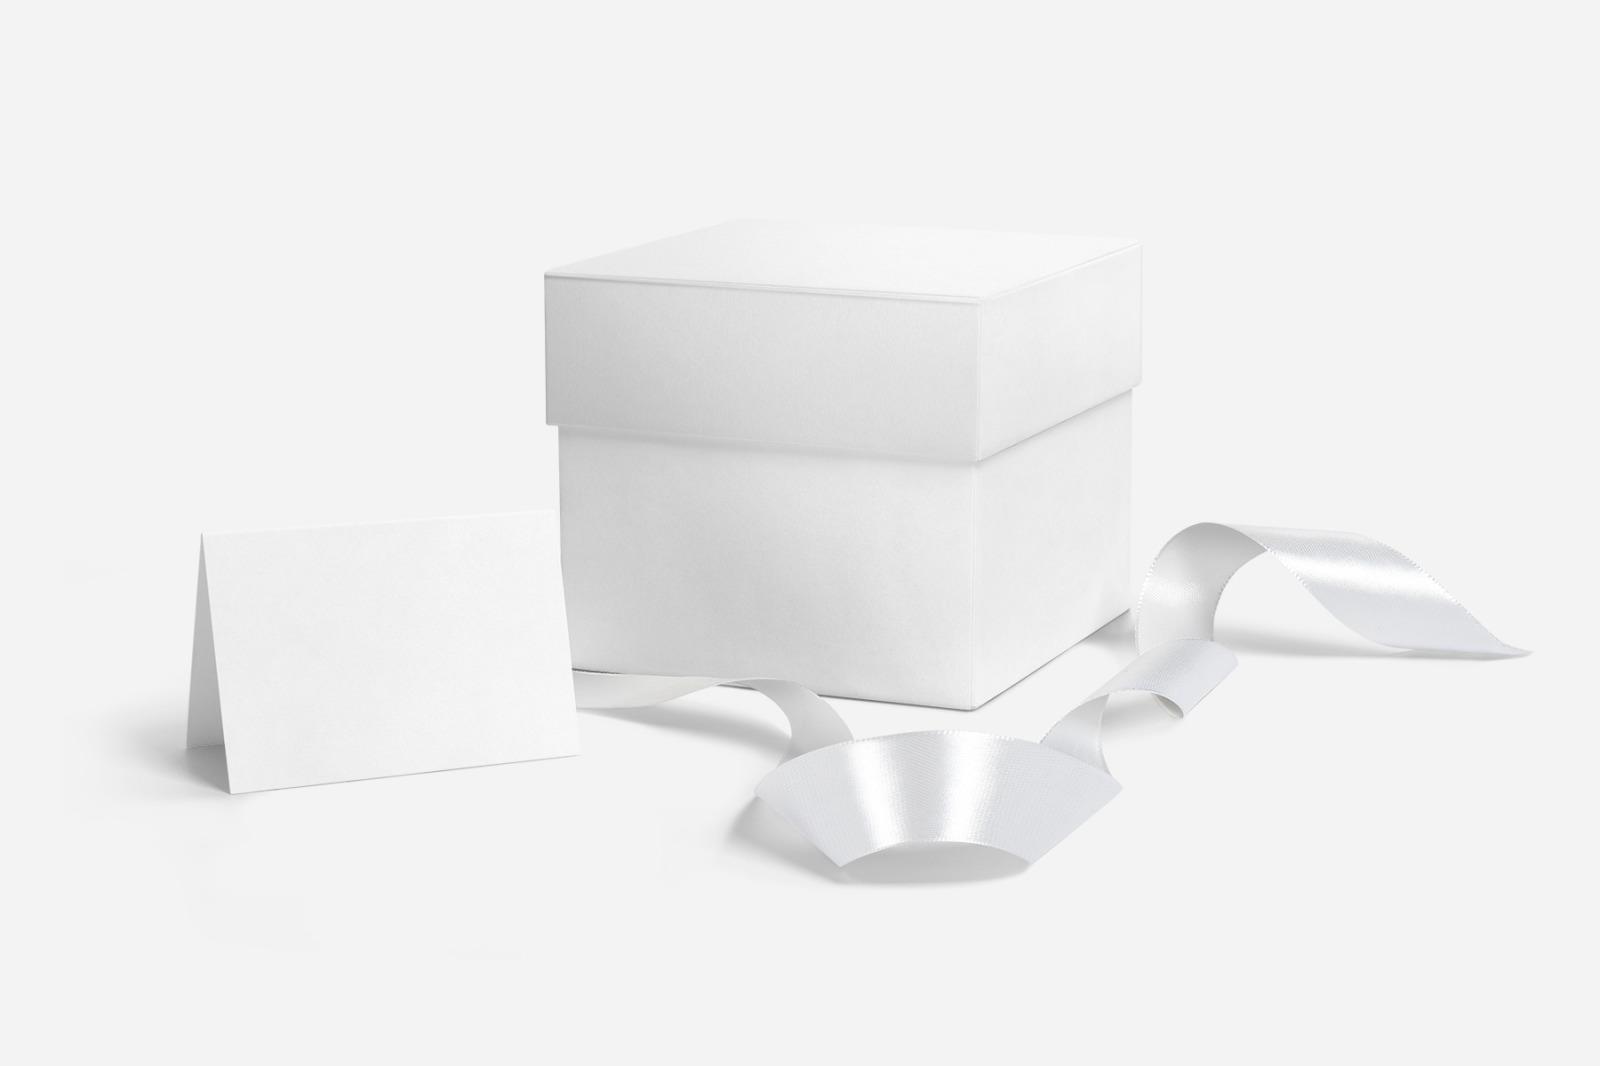 Gift Box Mockups Pack